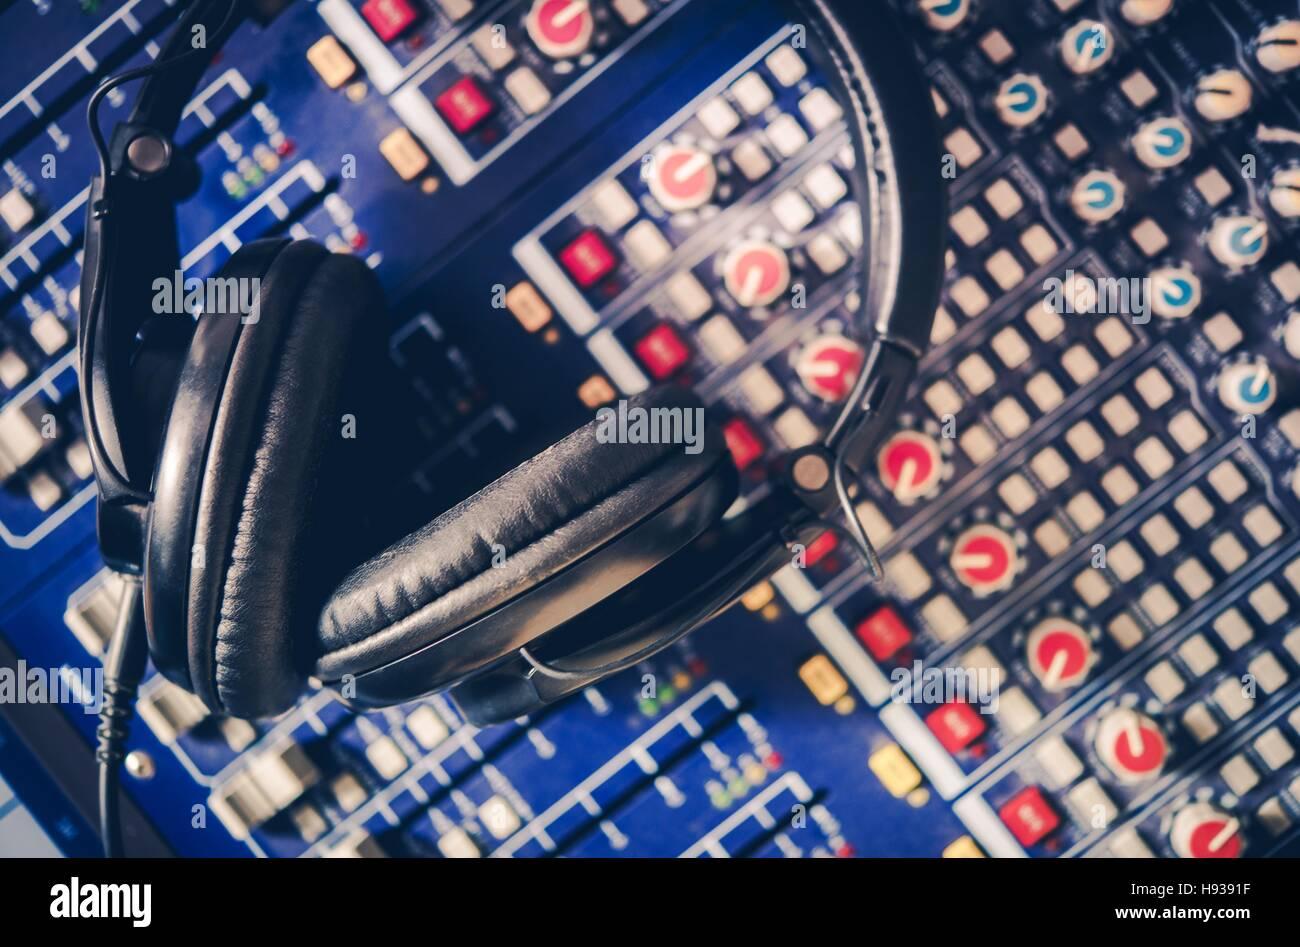 Pro Headphones on the Sound Mixing Table  Audio Mixer